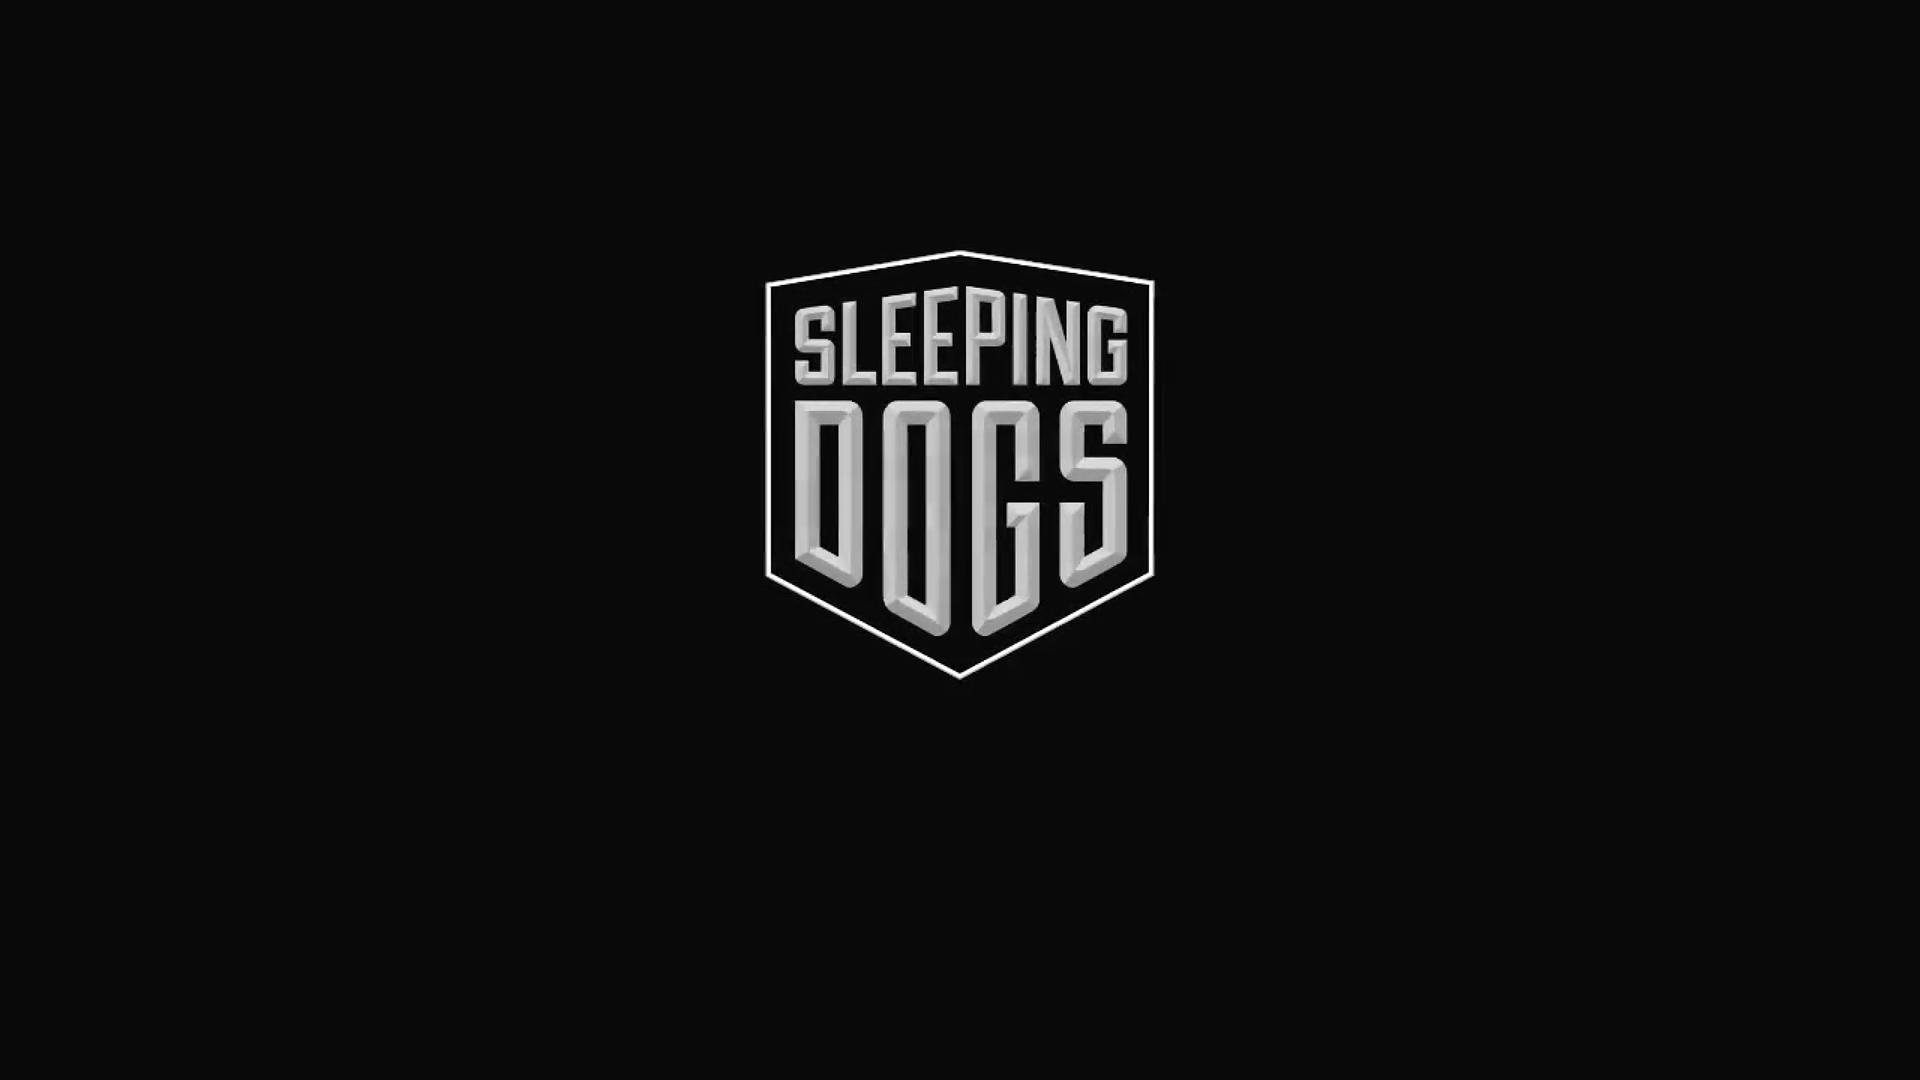 Sleeping Dogs wallpaper   667498 1920x1080